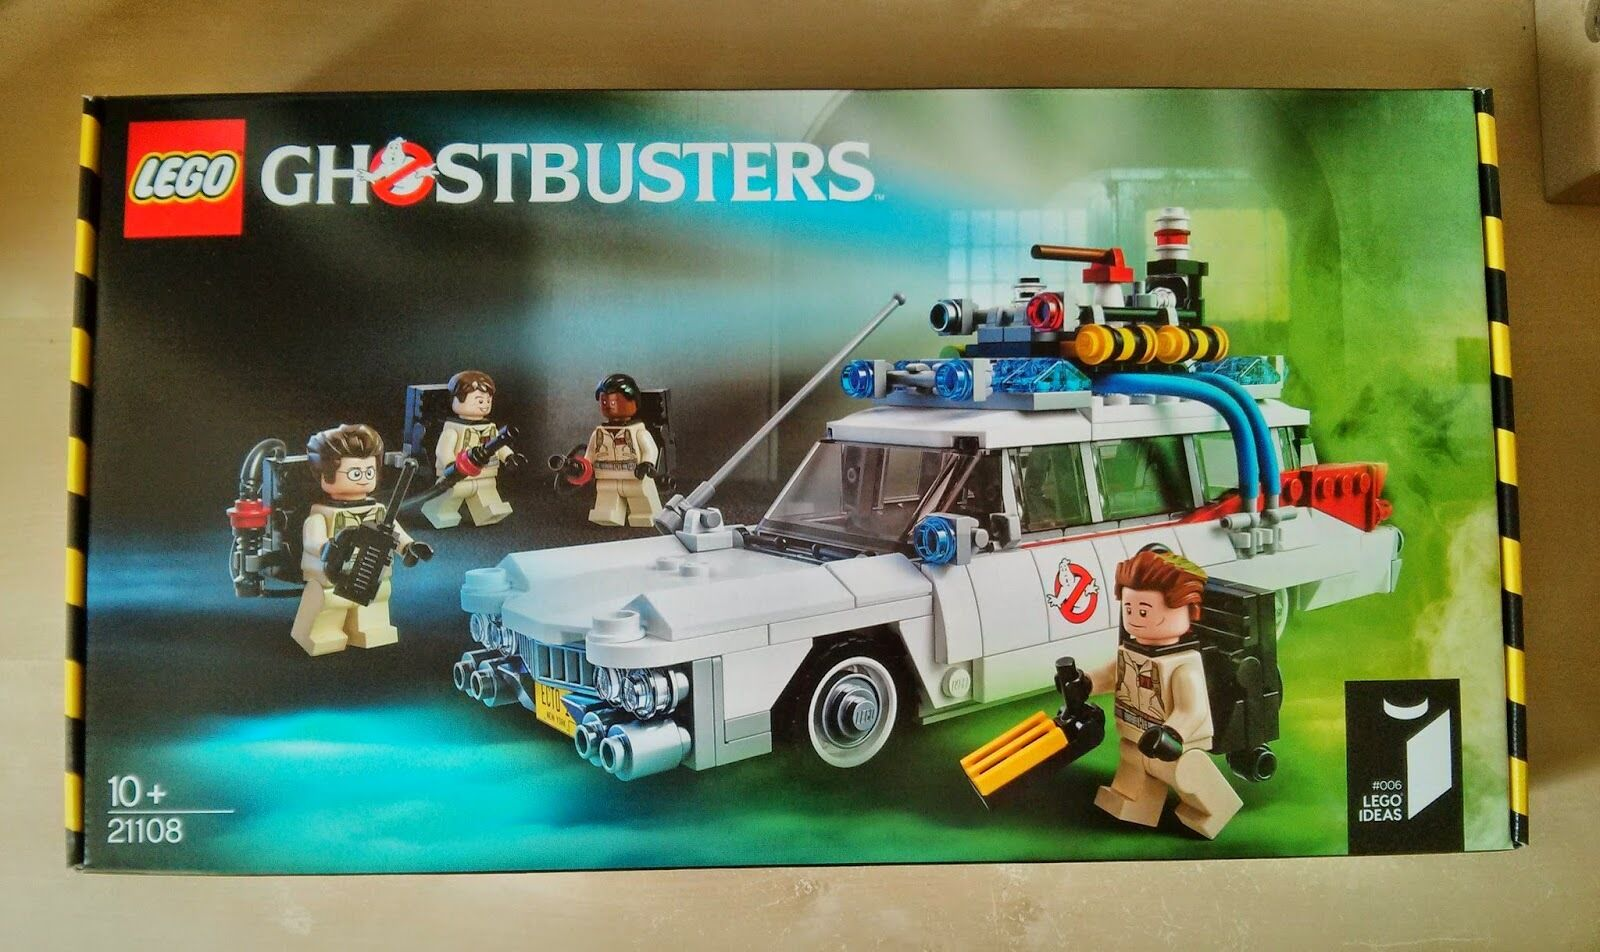 LEGO Ghostbusters Ghostbusters Ghostbusters Ecto-1 21108  - RETIRED BNIB 58e945